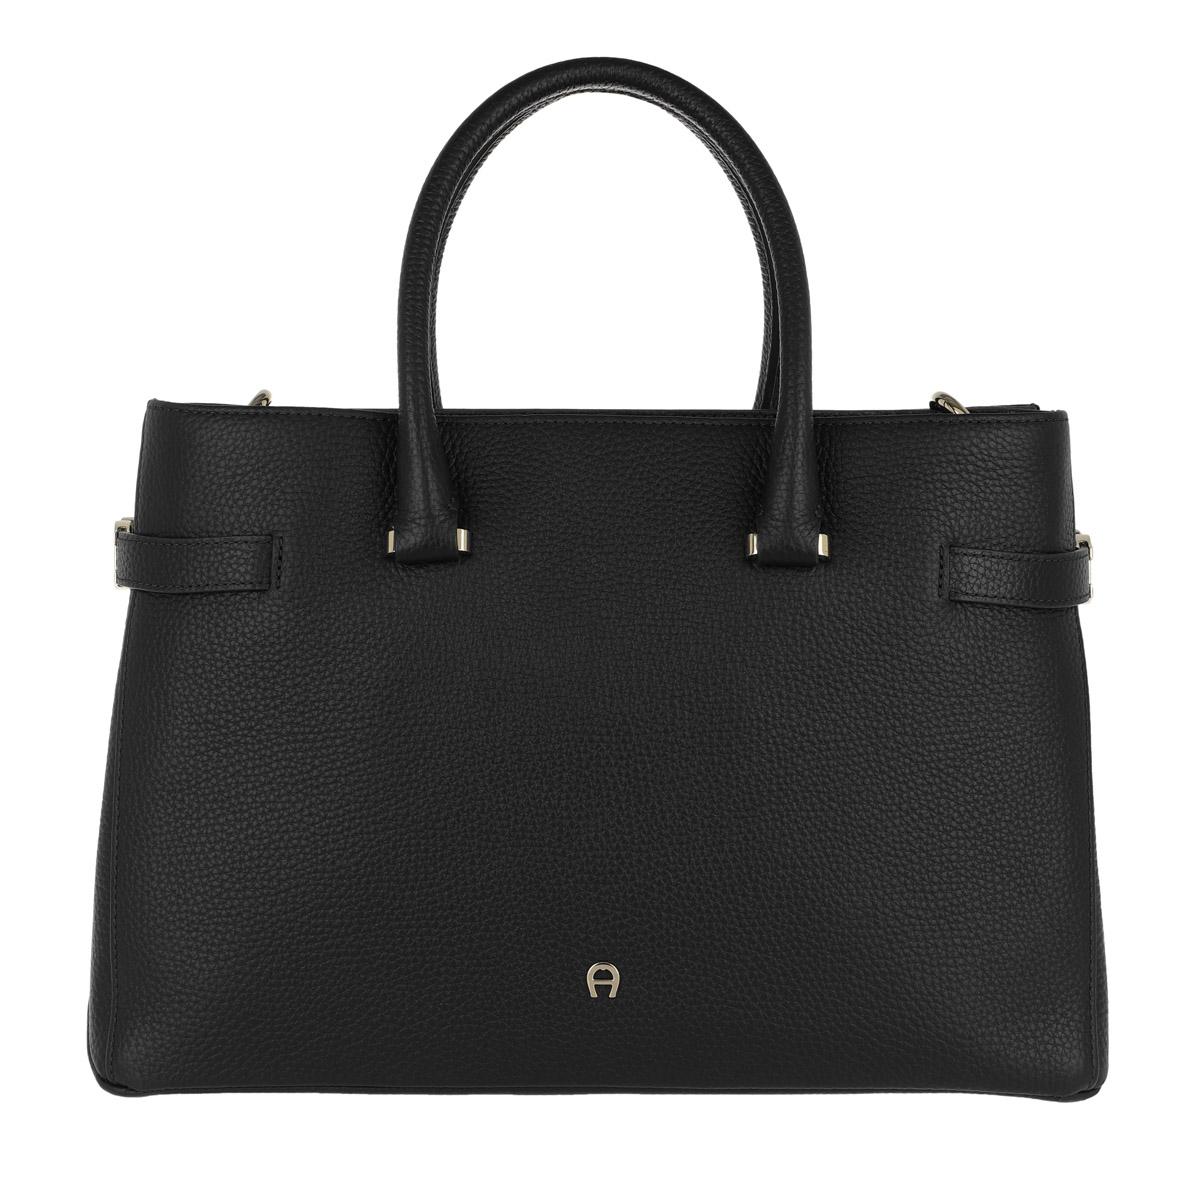 Aigner Tote - Roma M Handle Bag Black - in schwarz - für Damen